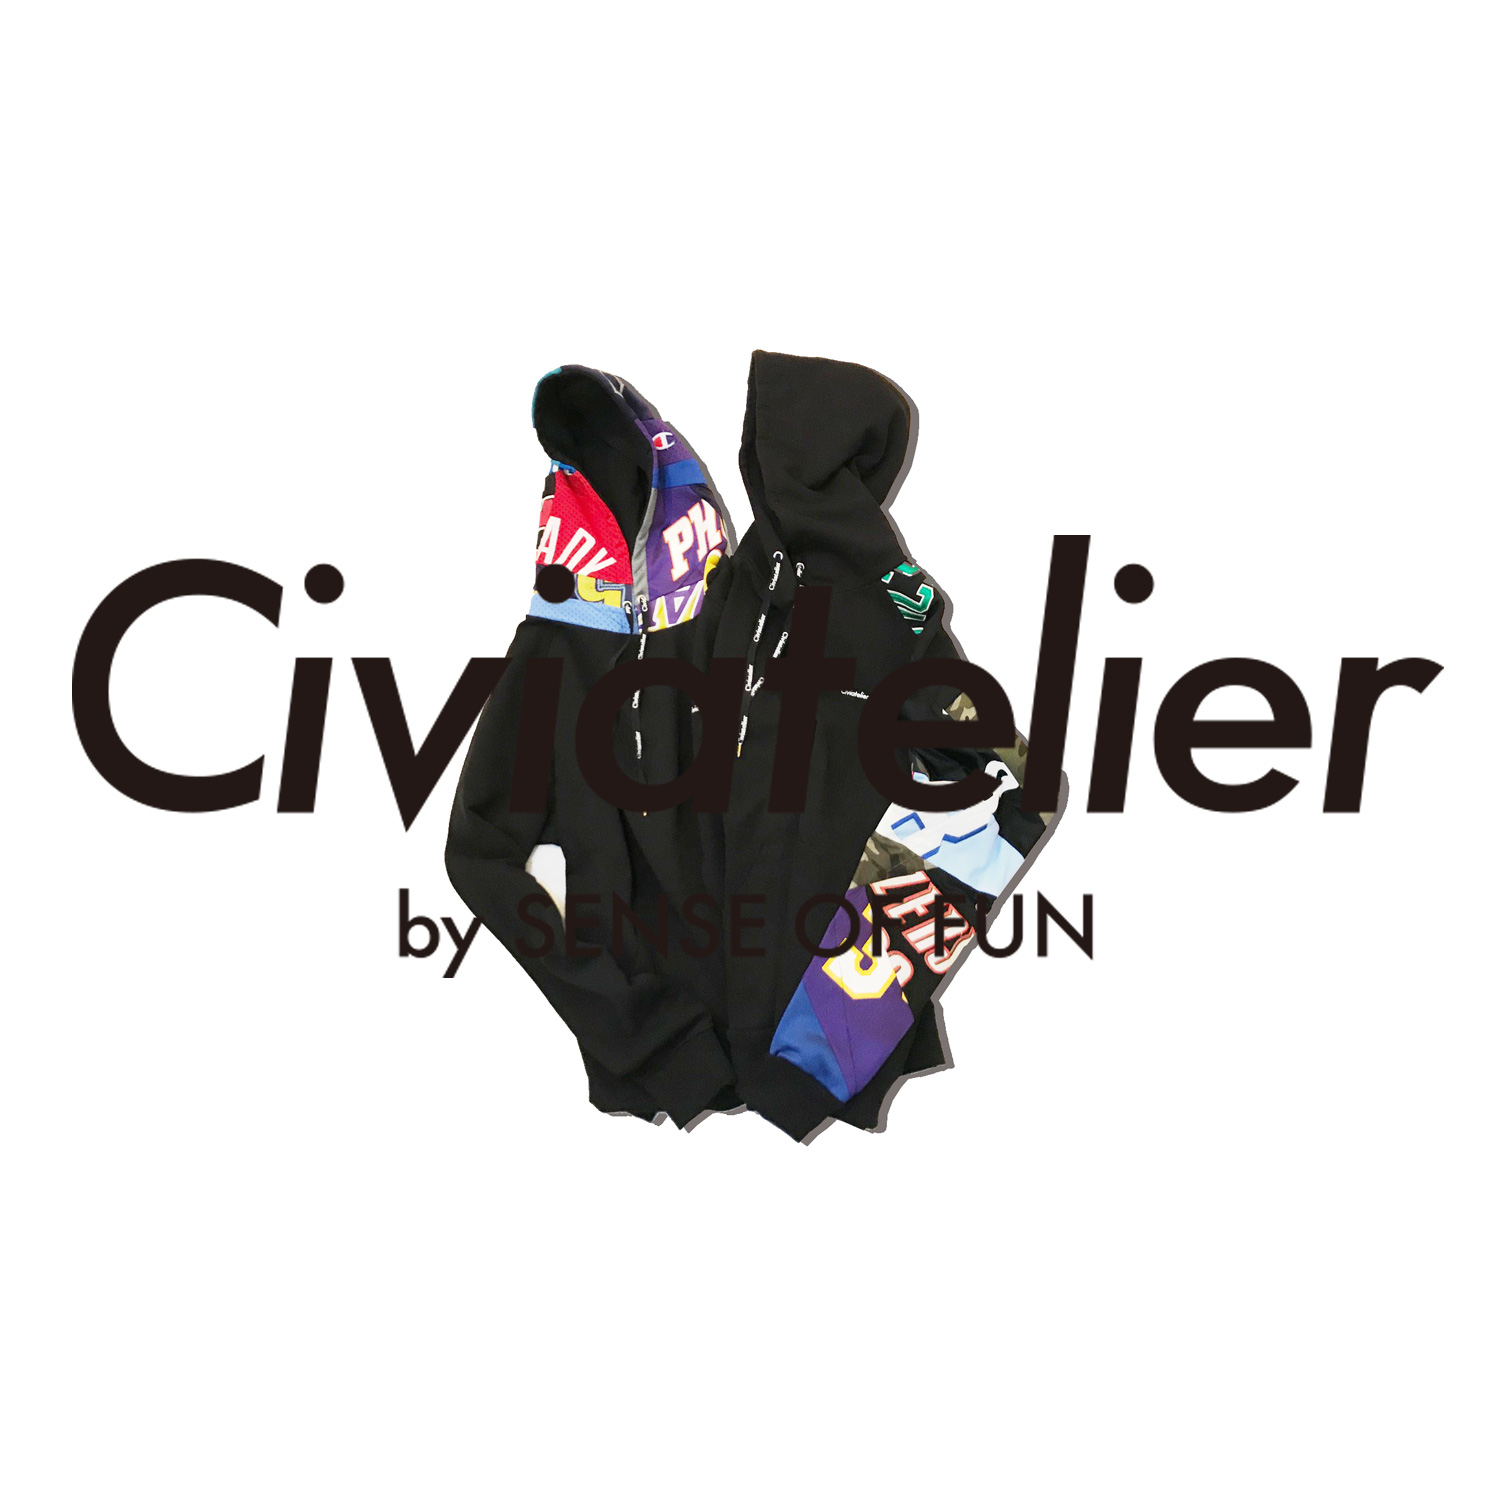 Civiatelier Versus Parka